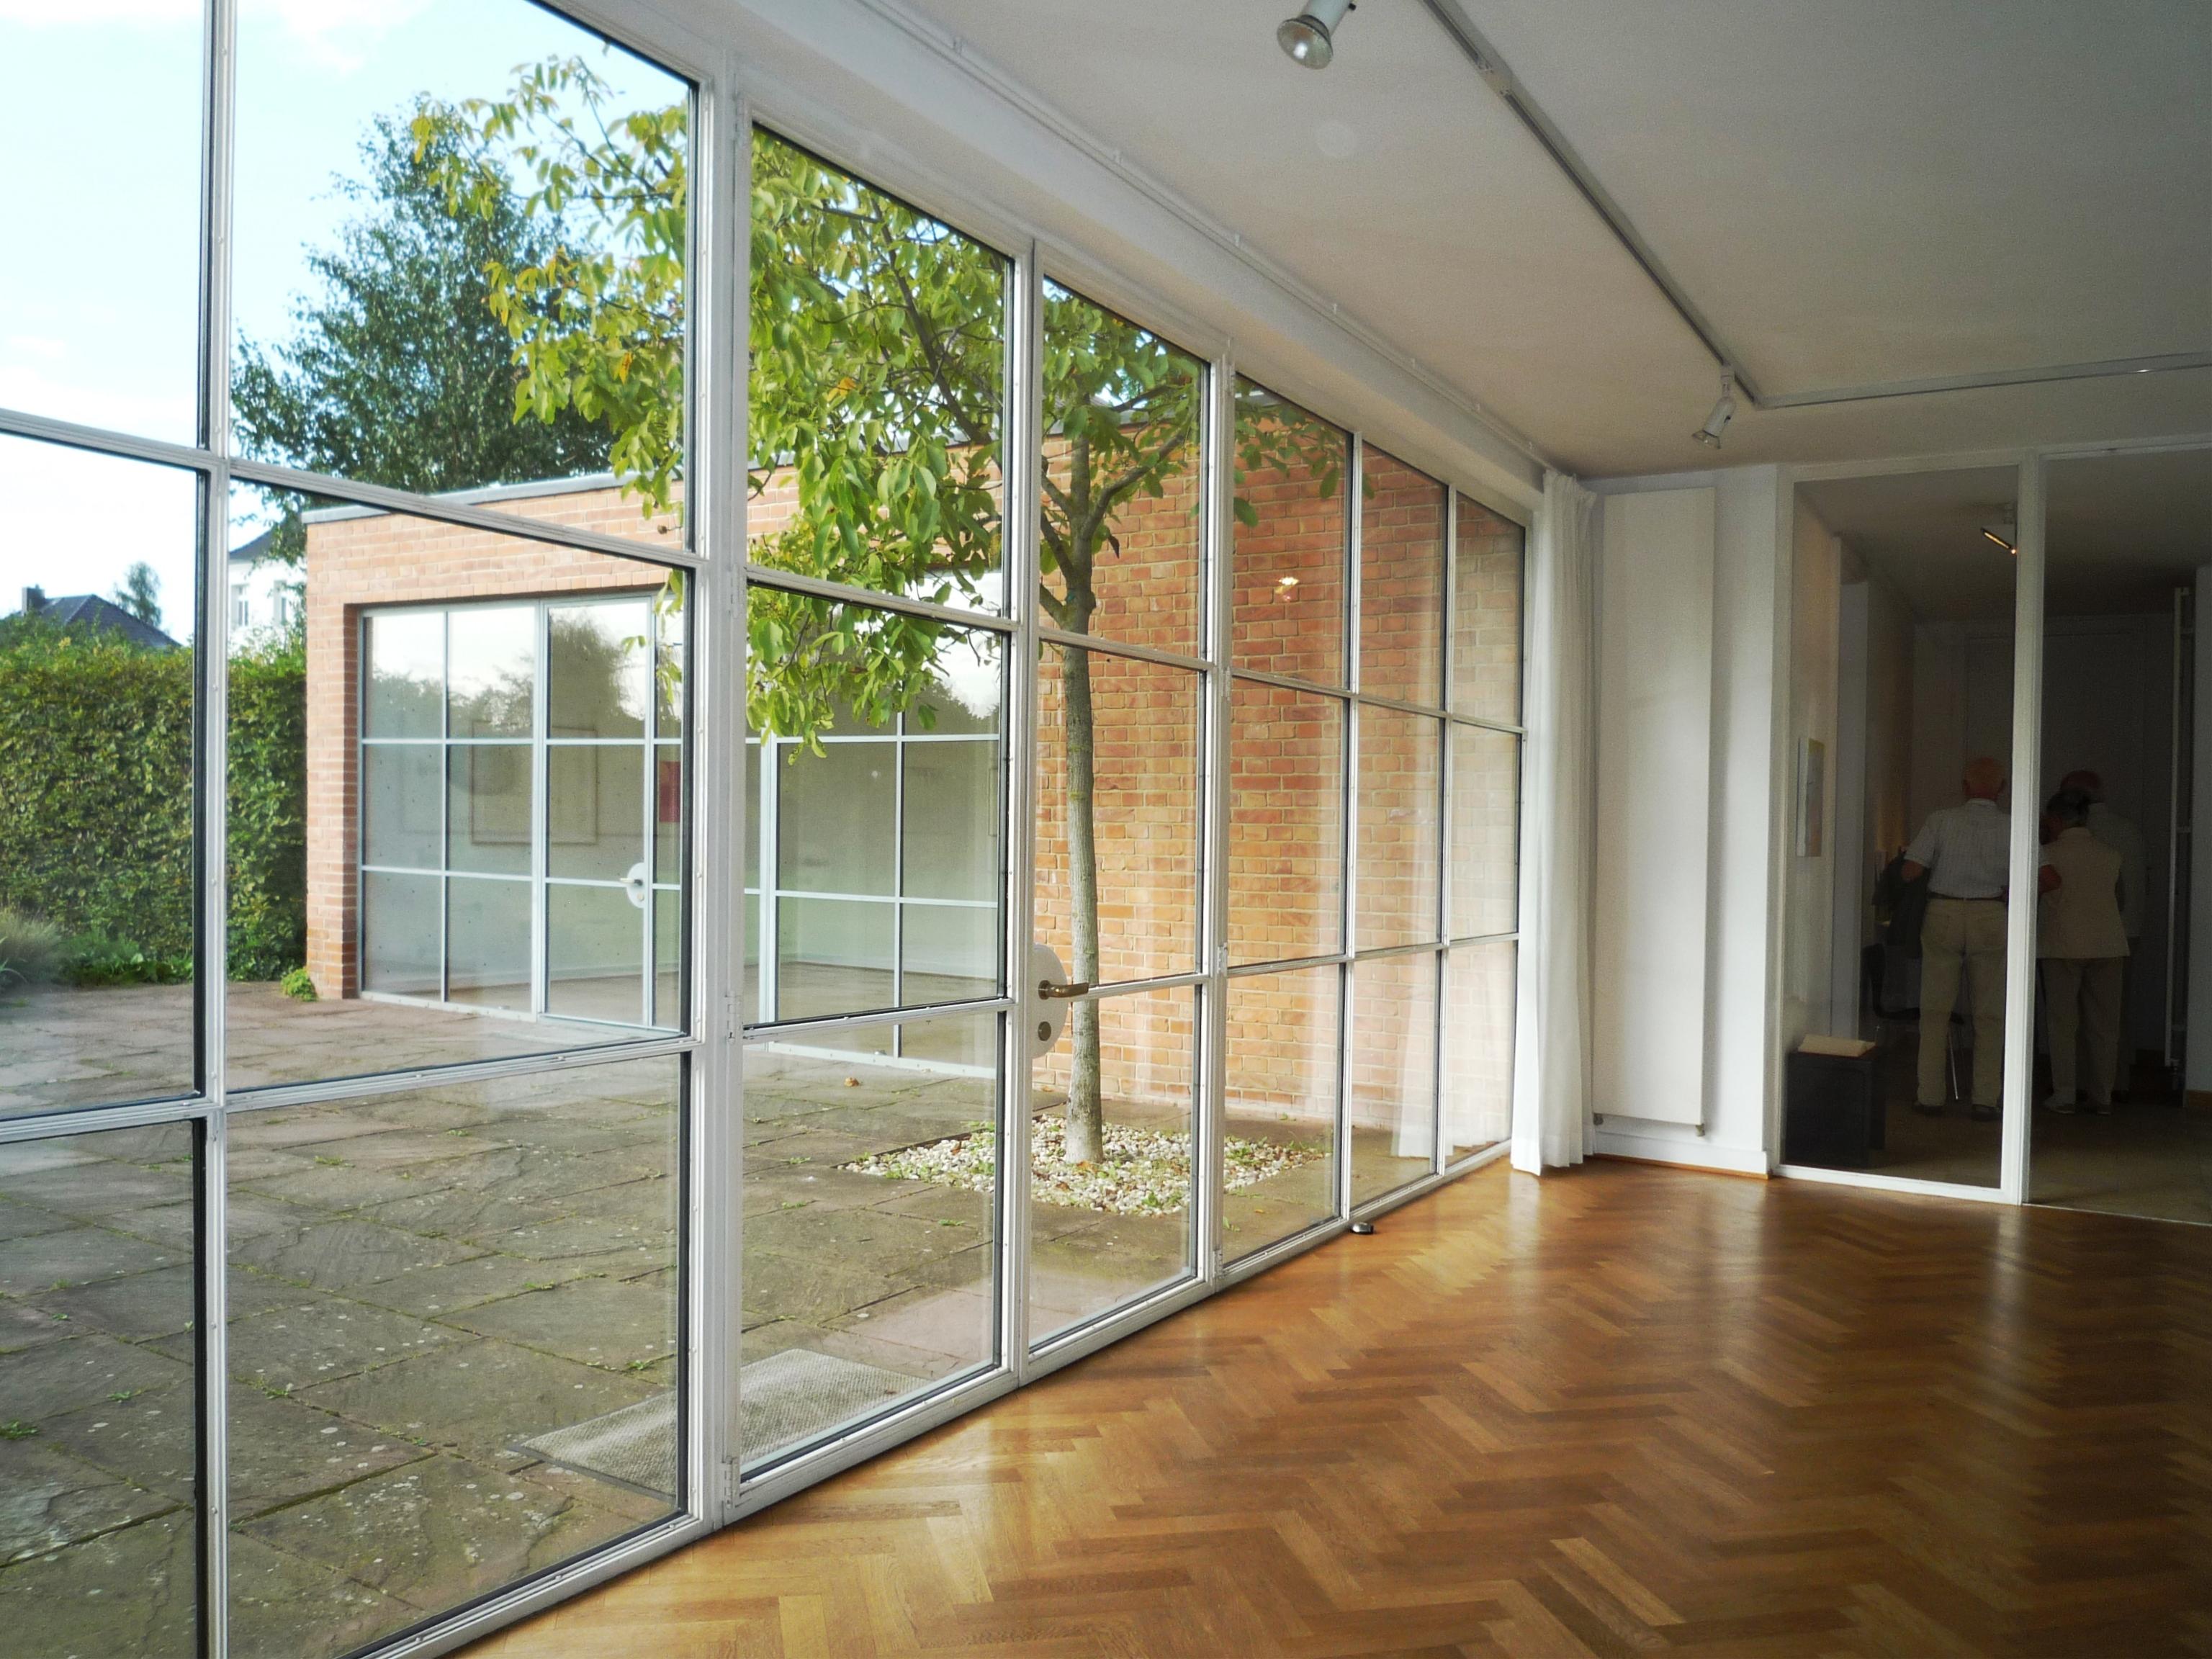 datei mies van der rohe haus berlin wikipedia. Black Bedroom Furniture Sets. Home Design Ideas